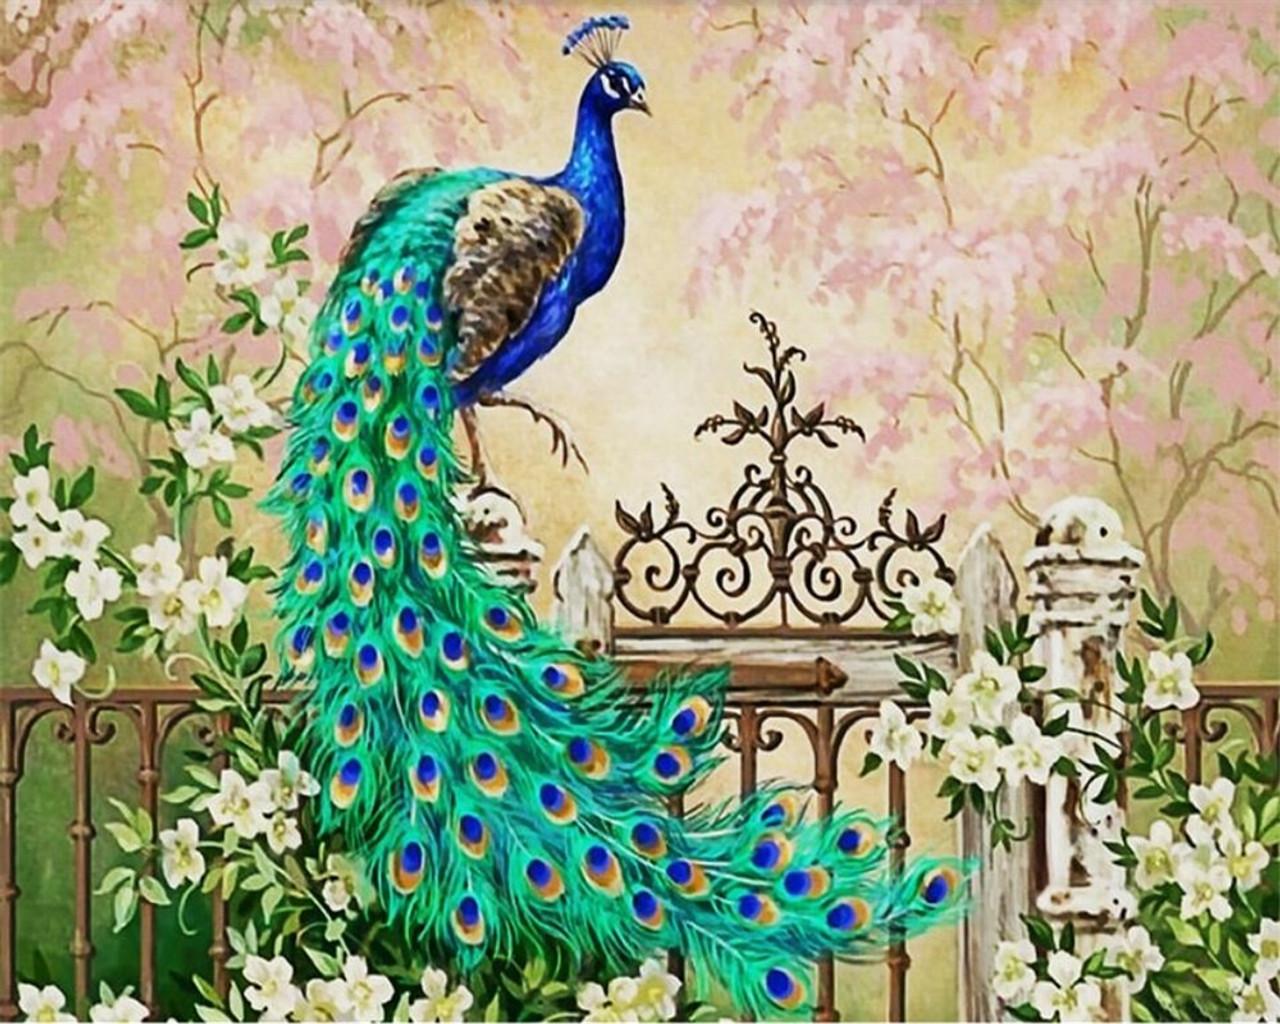 Beibehang Custom Large 3d Wallpaper Peacock European Oil Painting